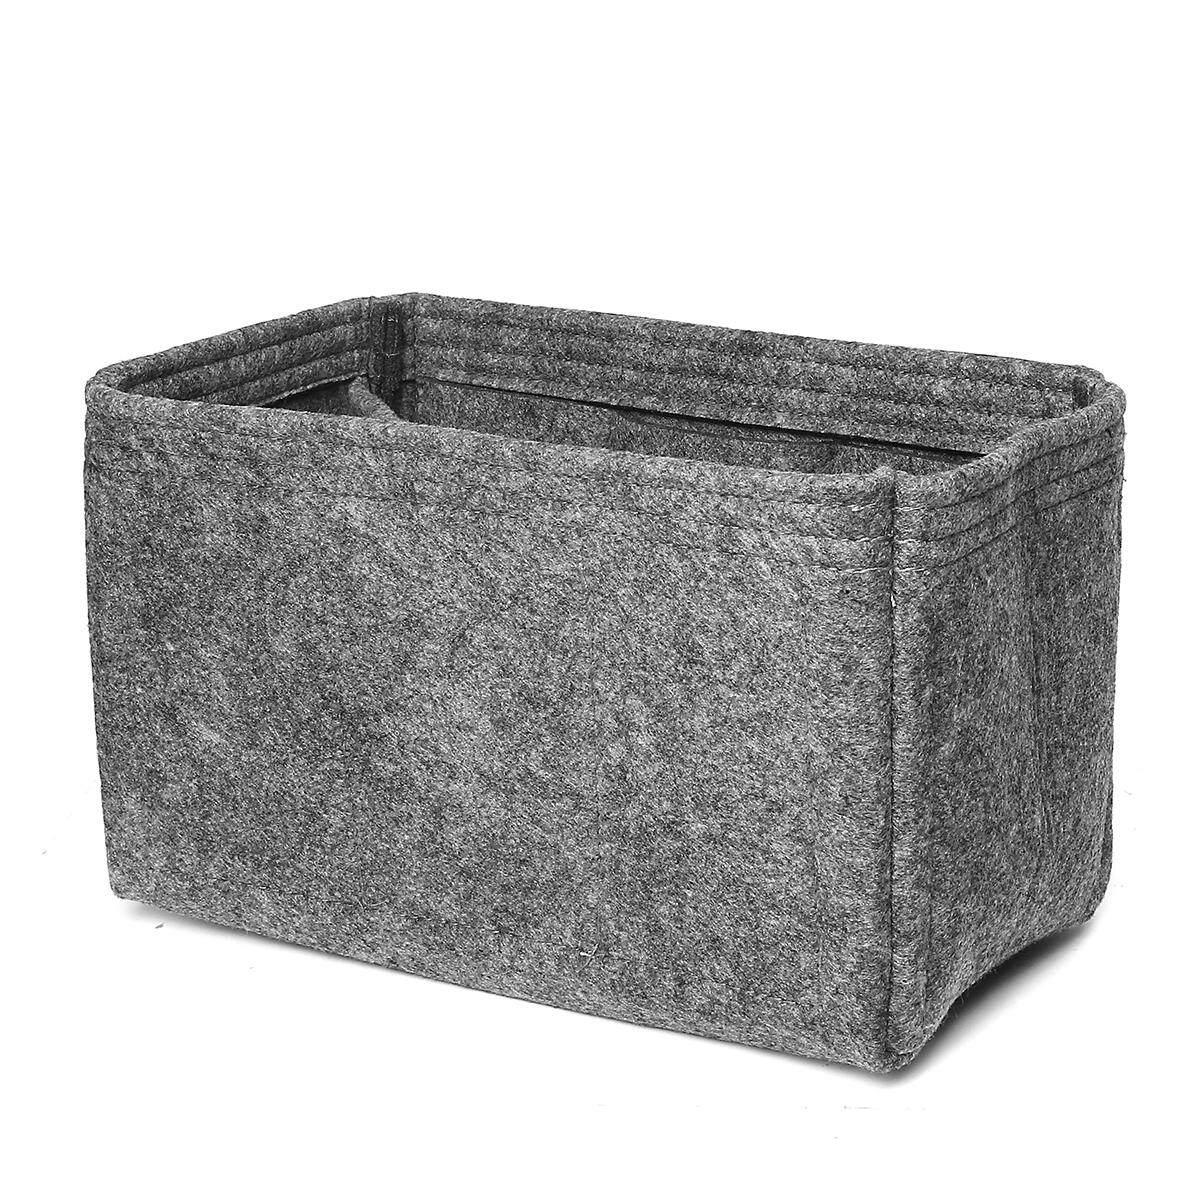 26x15x14cm Felt Insert Handbag Organizer Travel Purse Bag Organizer Storage gray - intl